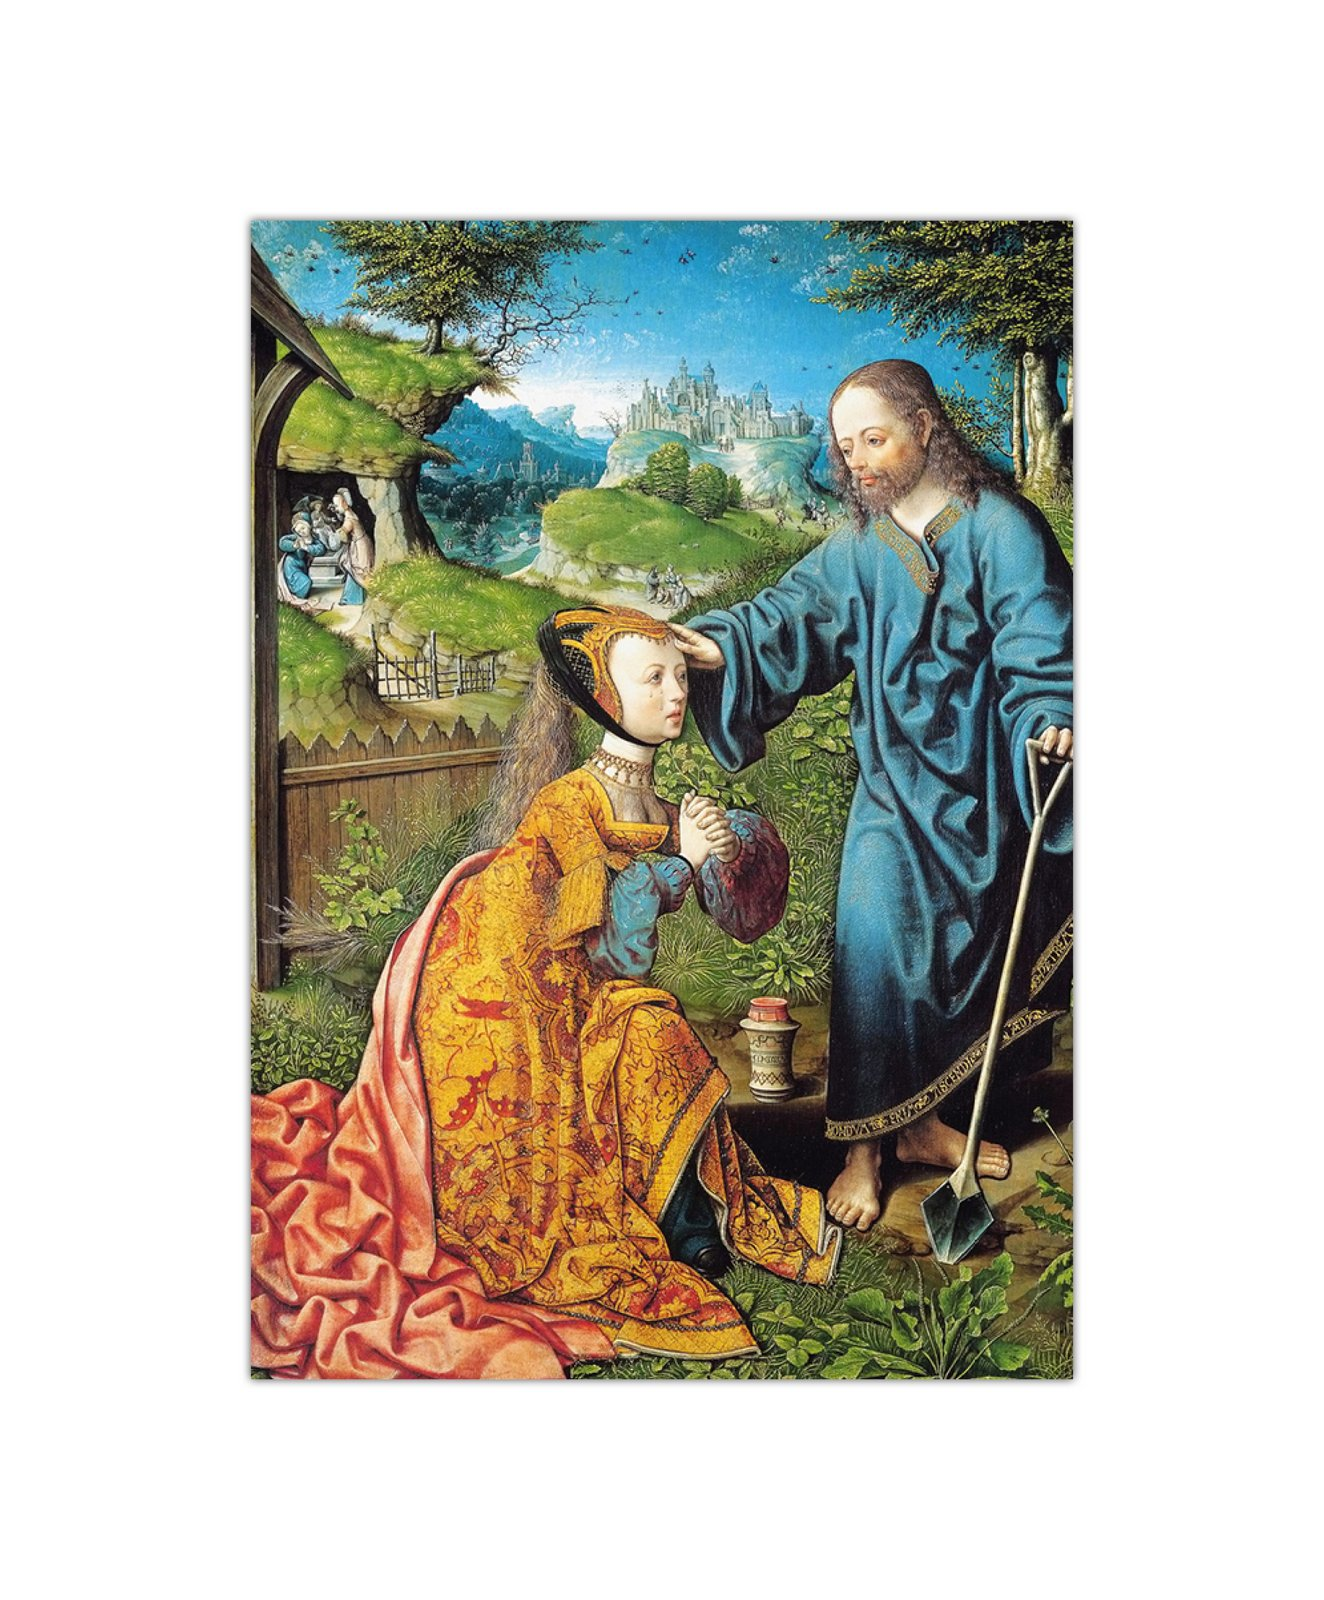 Jacob Cornelisz. van Oostsanen, Noli me tangere, 1507 2